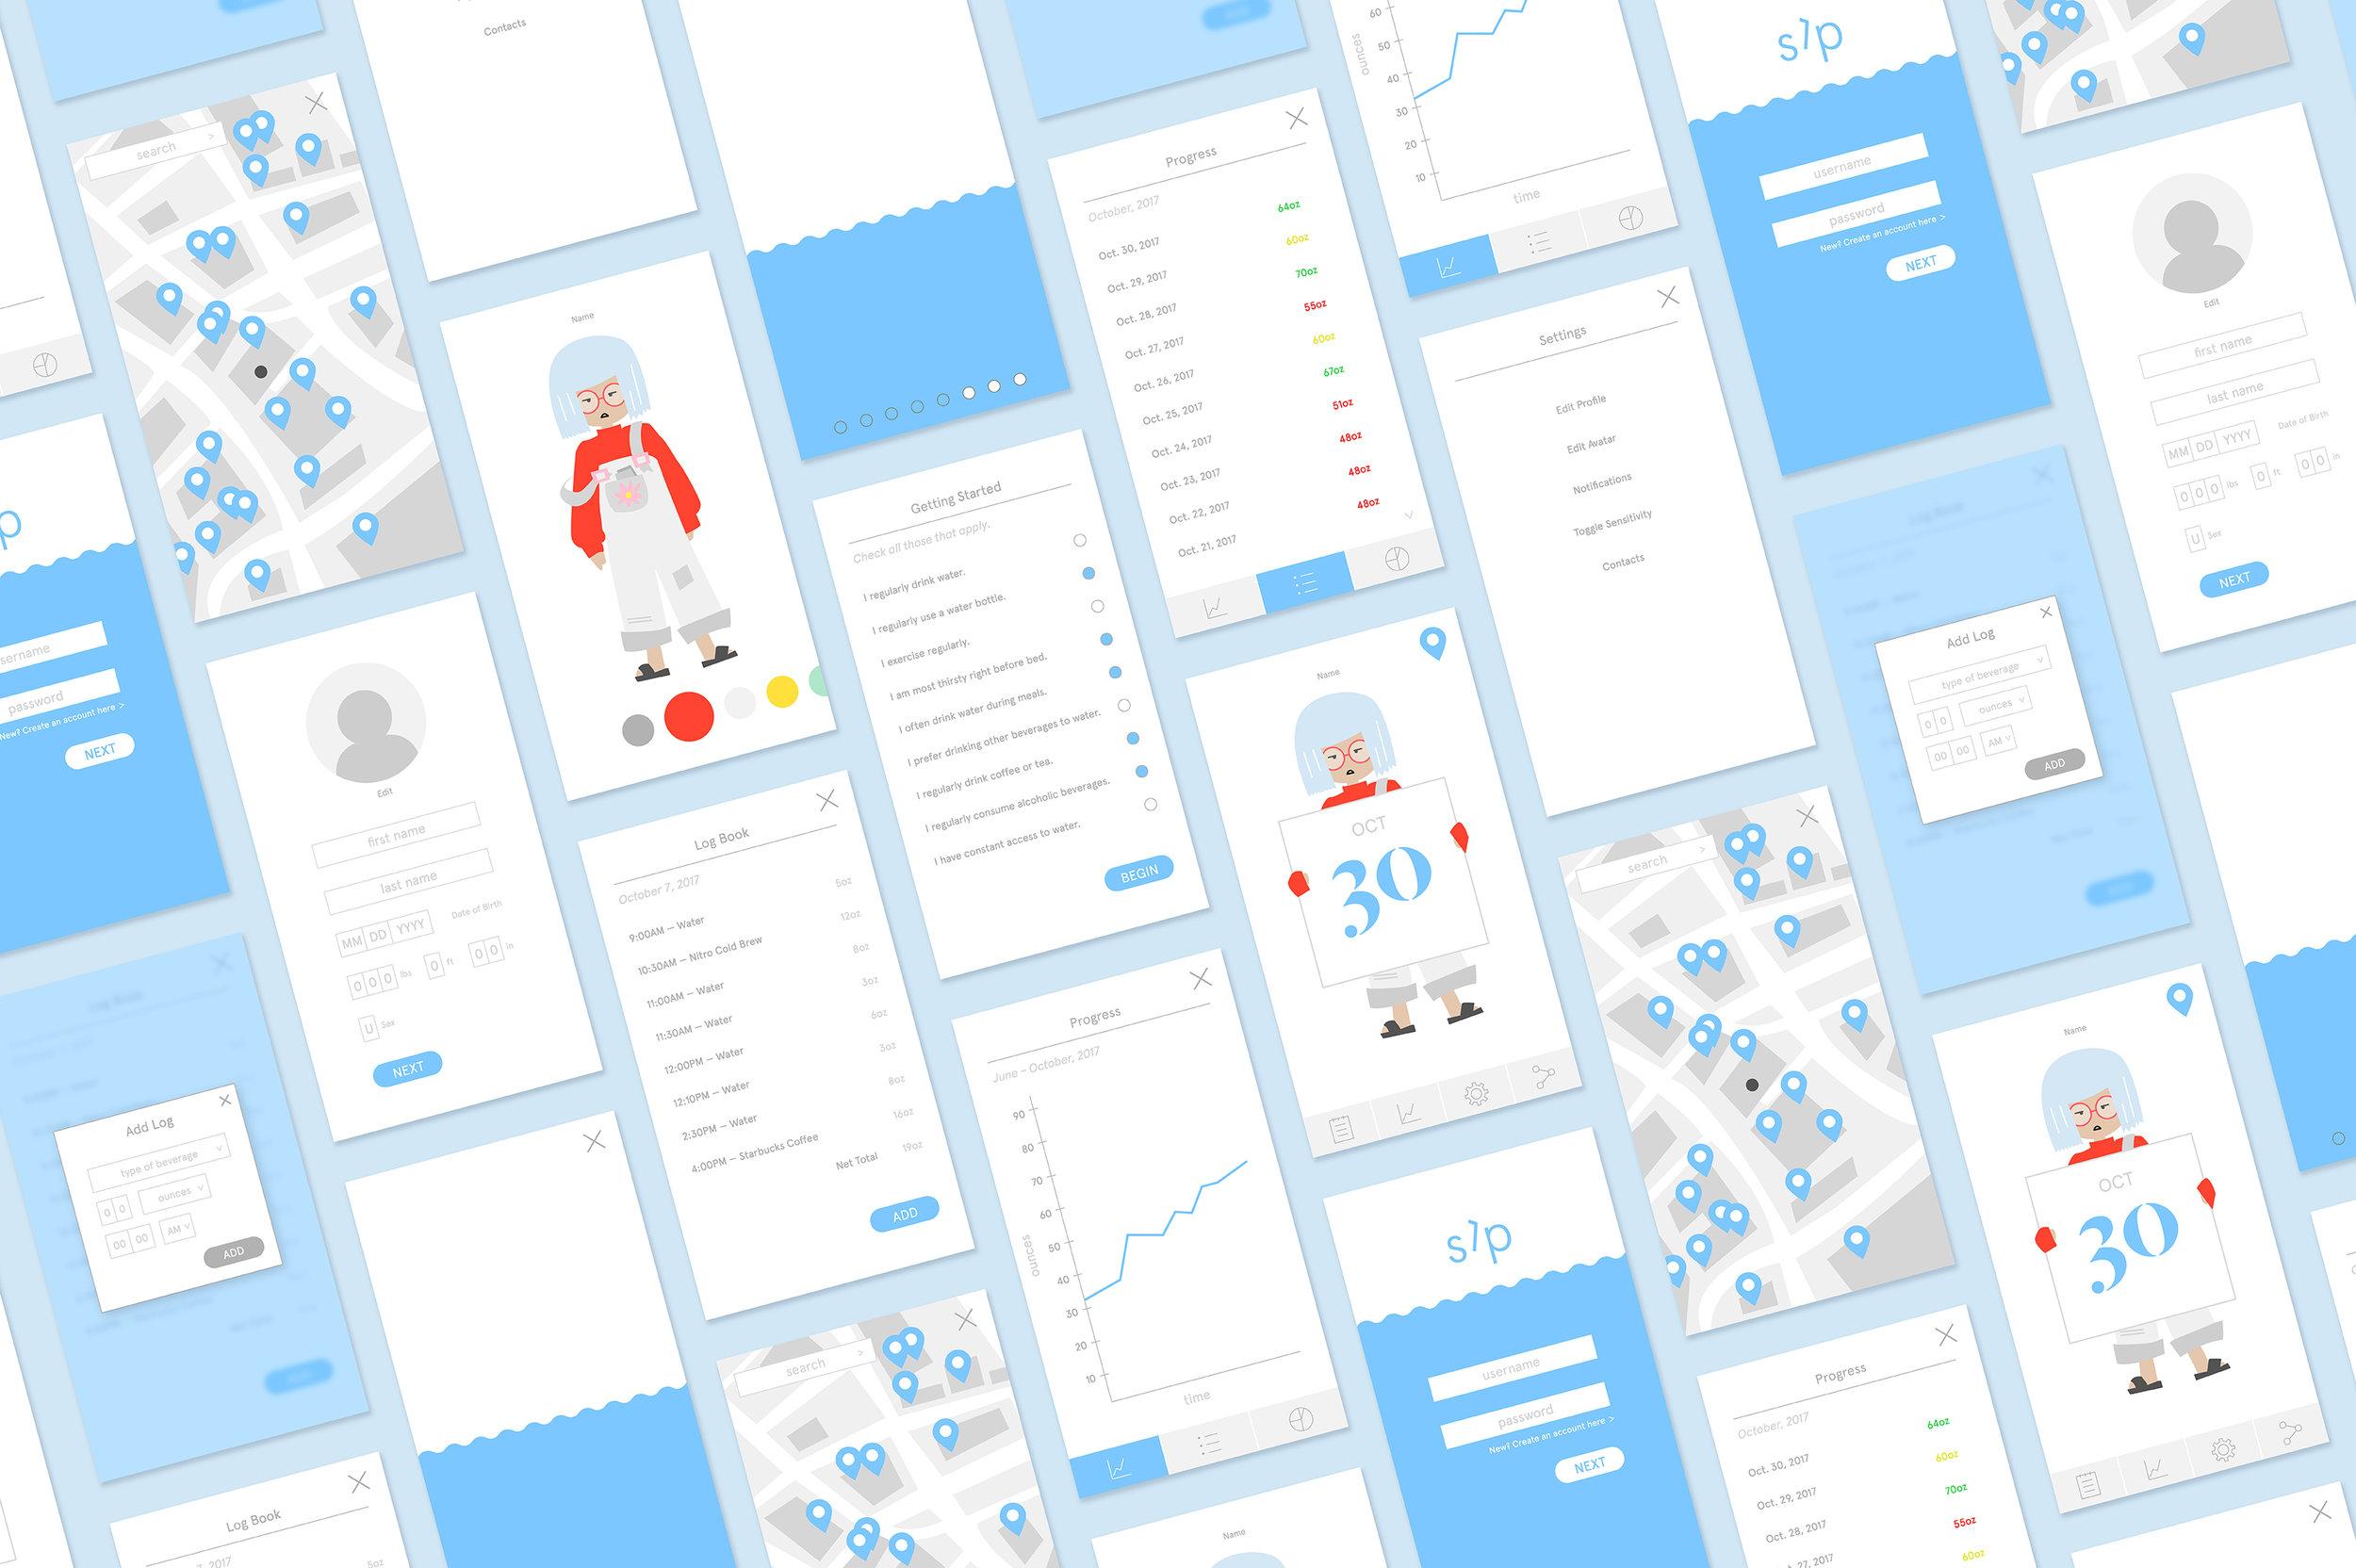 screens-small.jpg